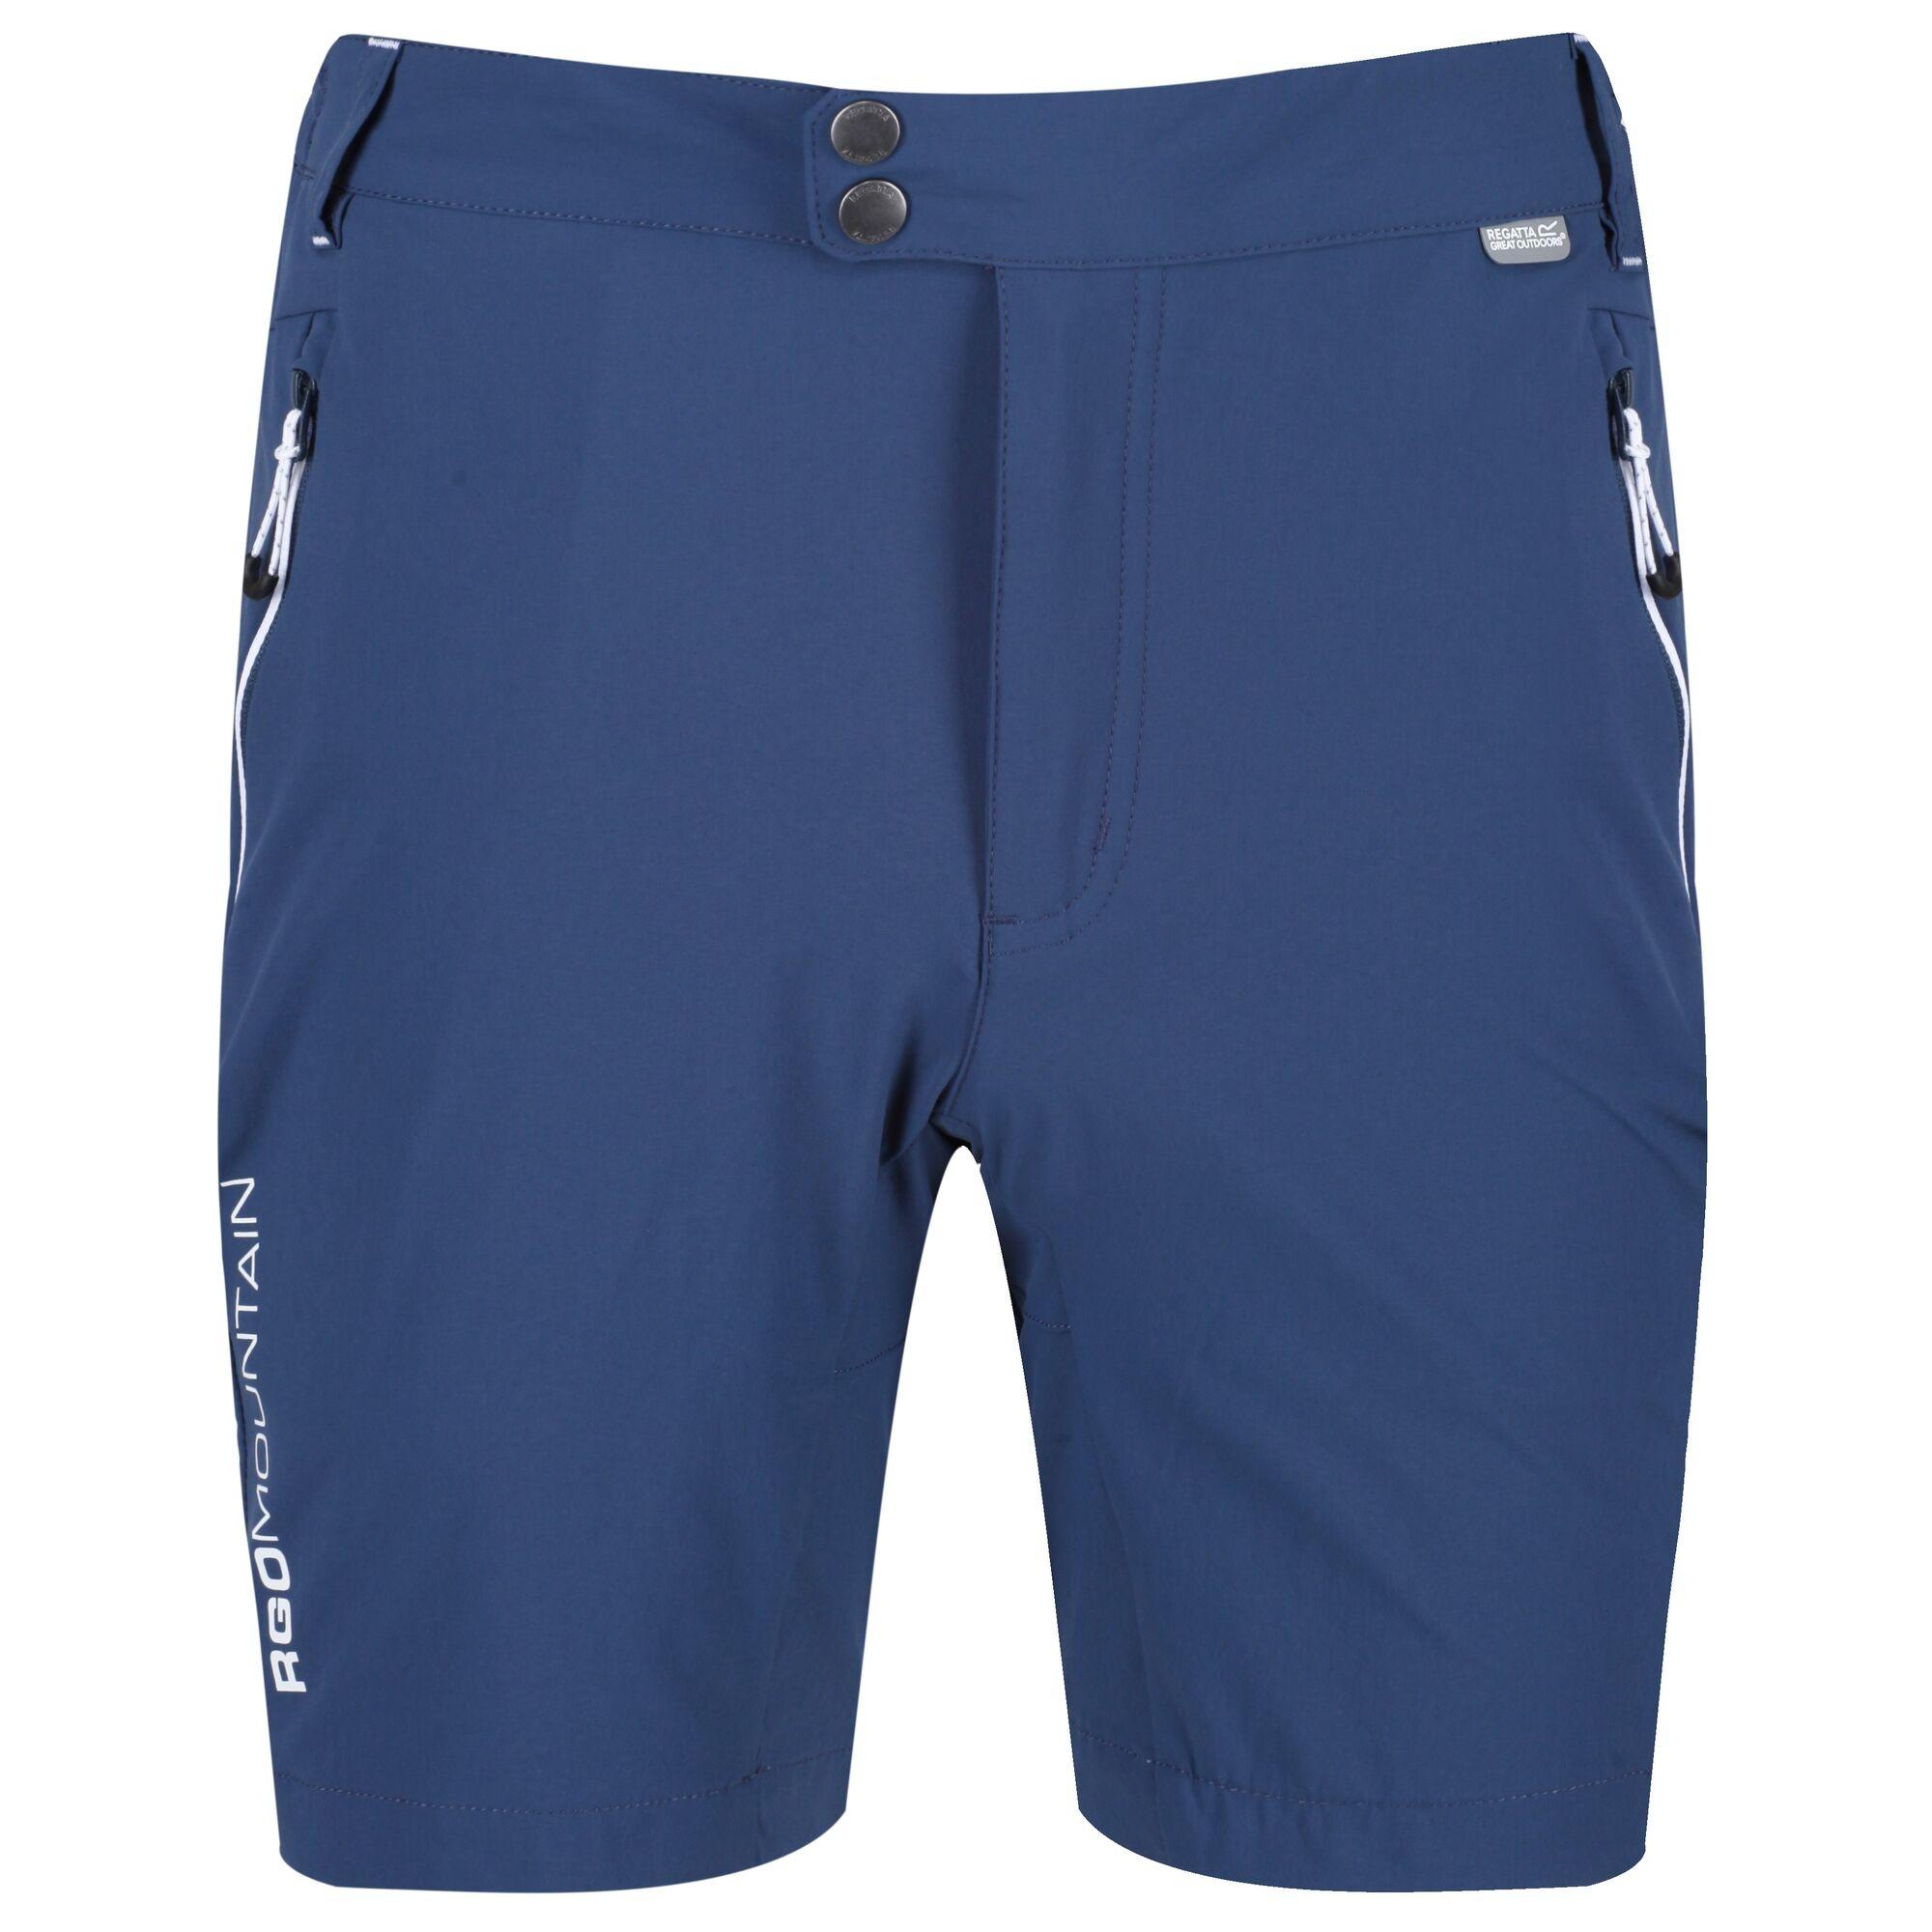 Regatta Mens Walking Shorts (32R) (Dark Denim)